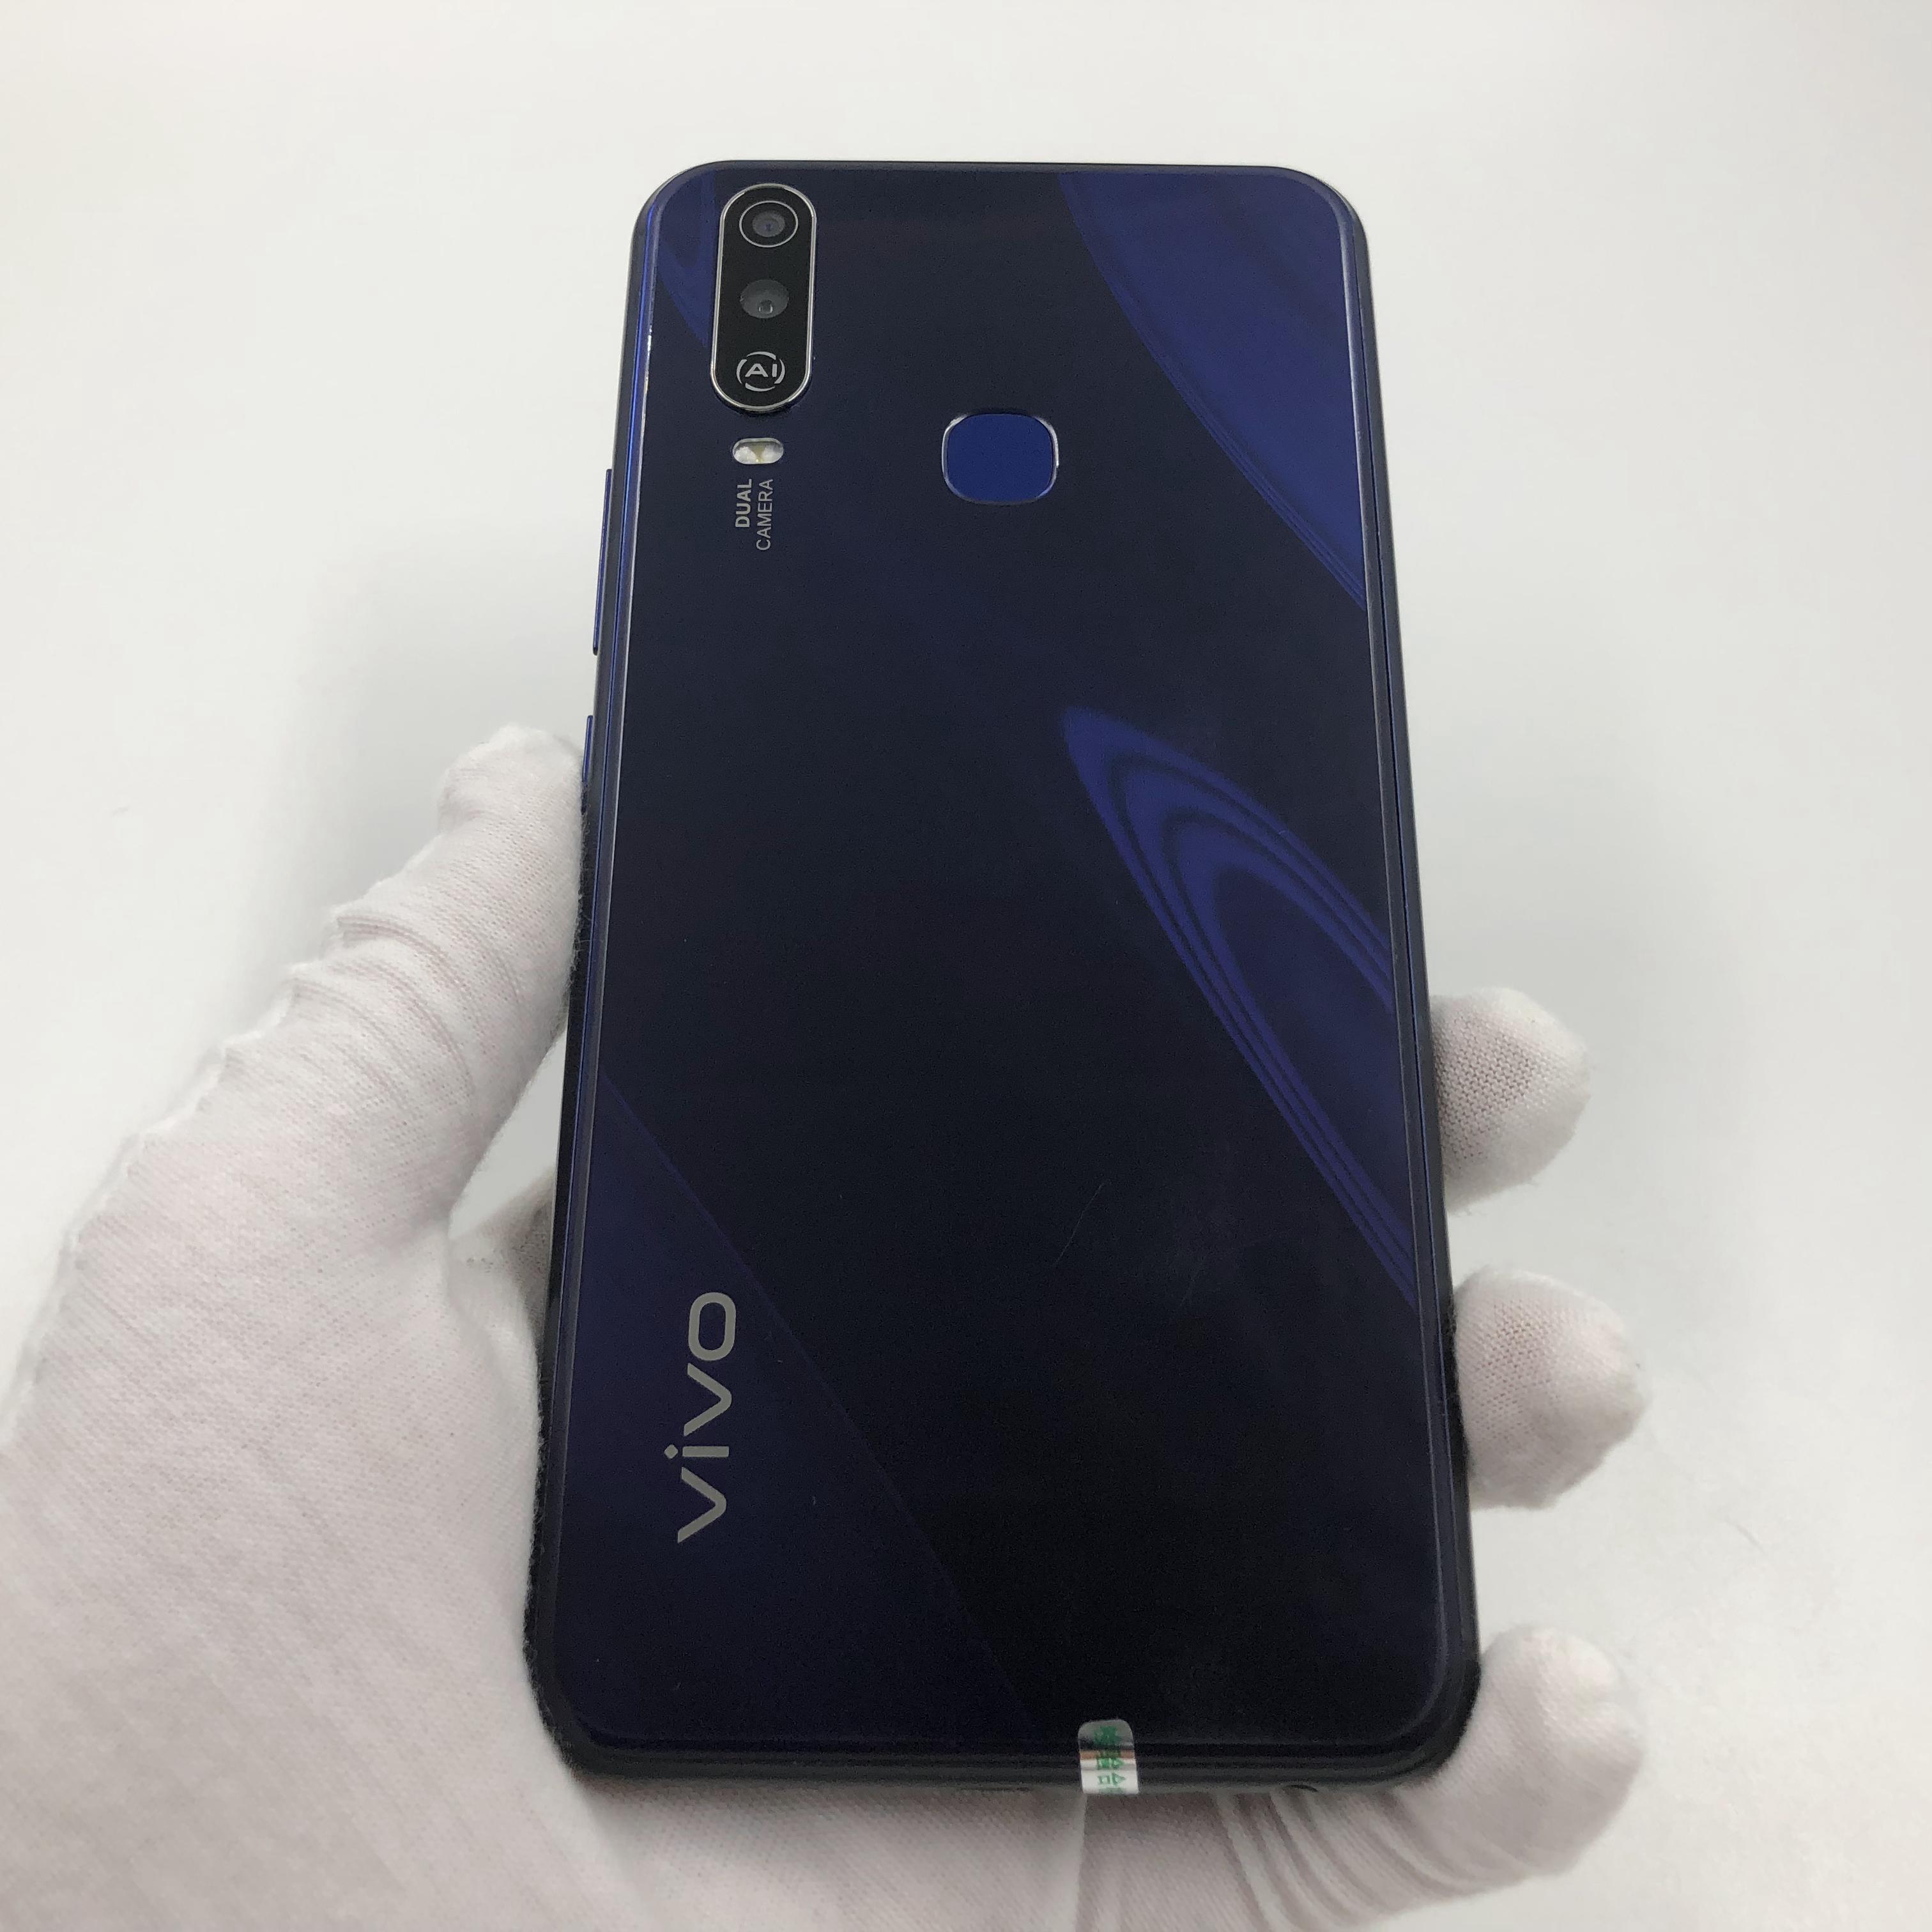 vivo【Y3s】4G全网通 暗夜蓝 4G/128G 国行 95新 真机实拍原包装盒+配件